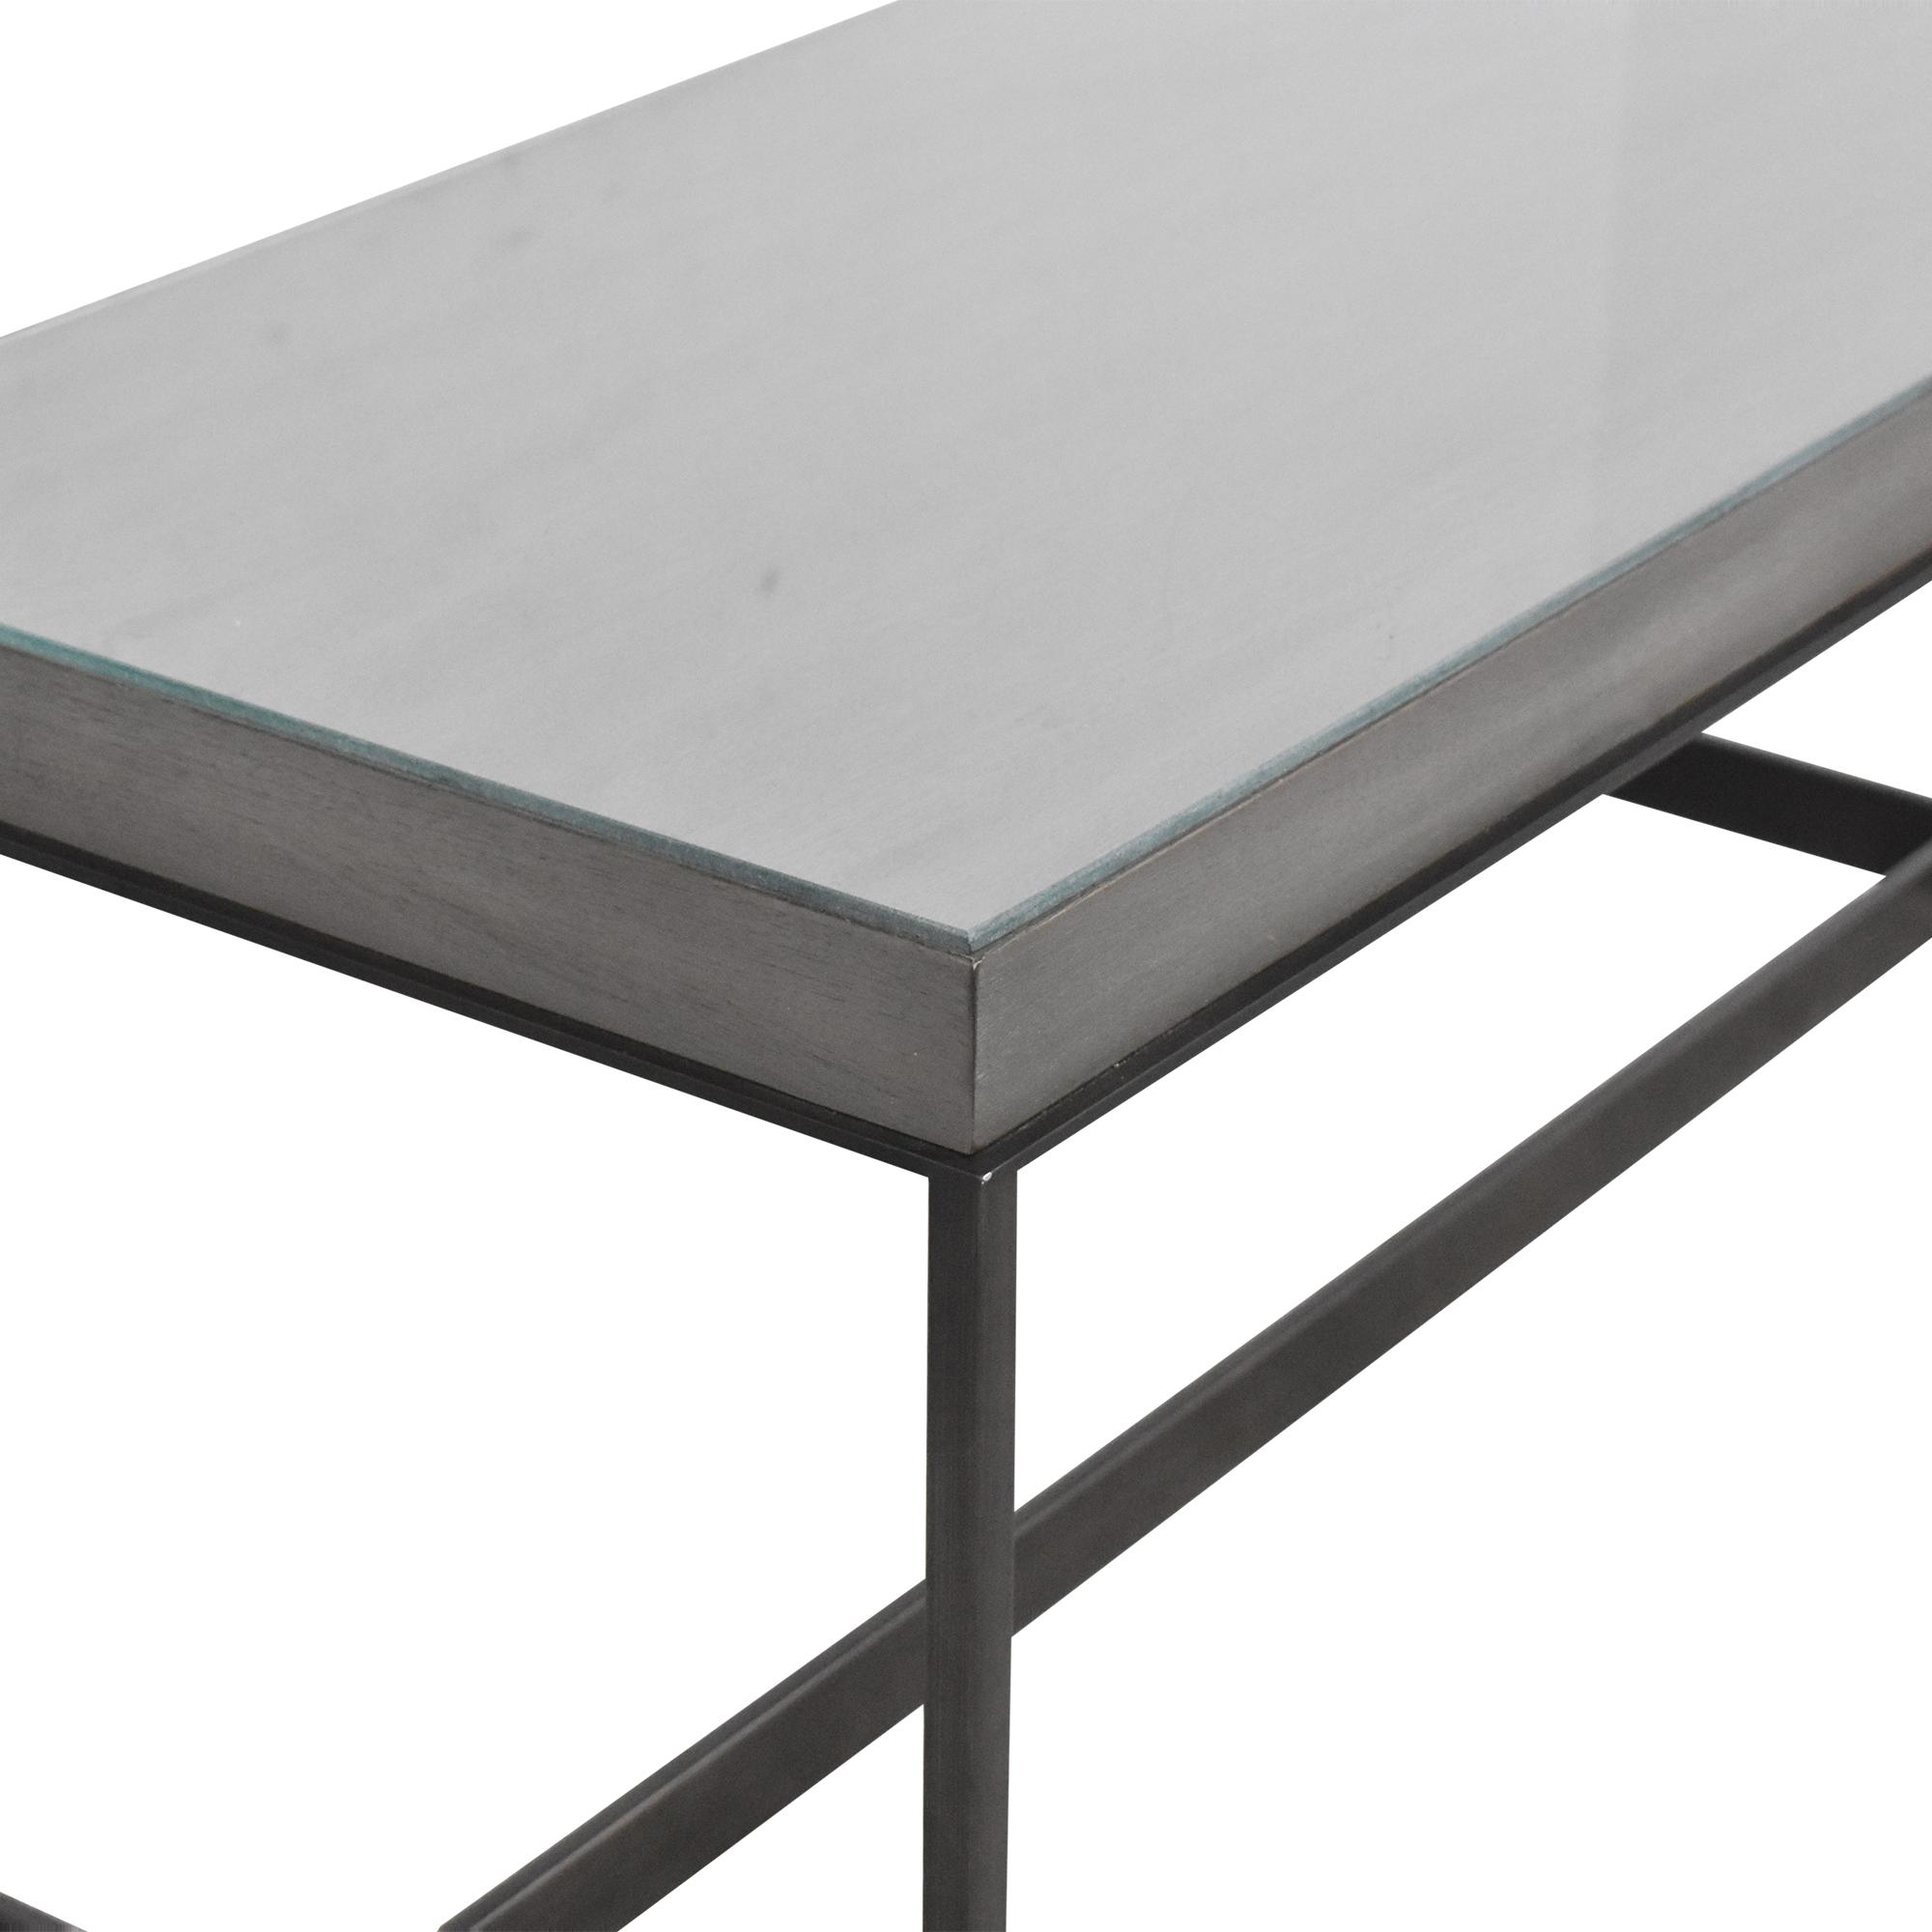 Ethan Allen Ethan Allen Edmonds Rectangular Coffee Table used